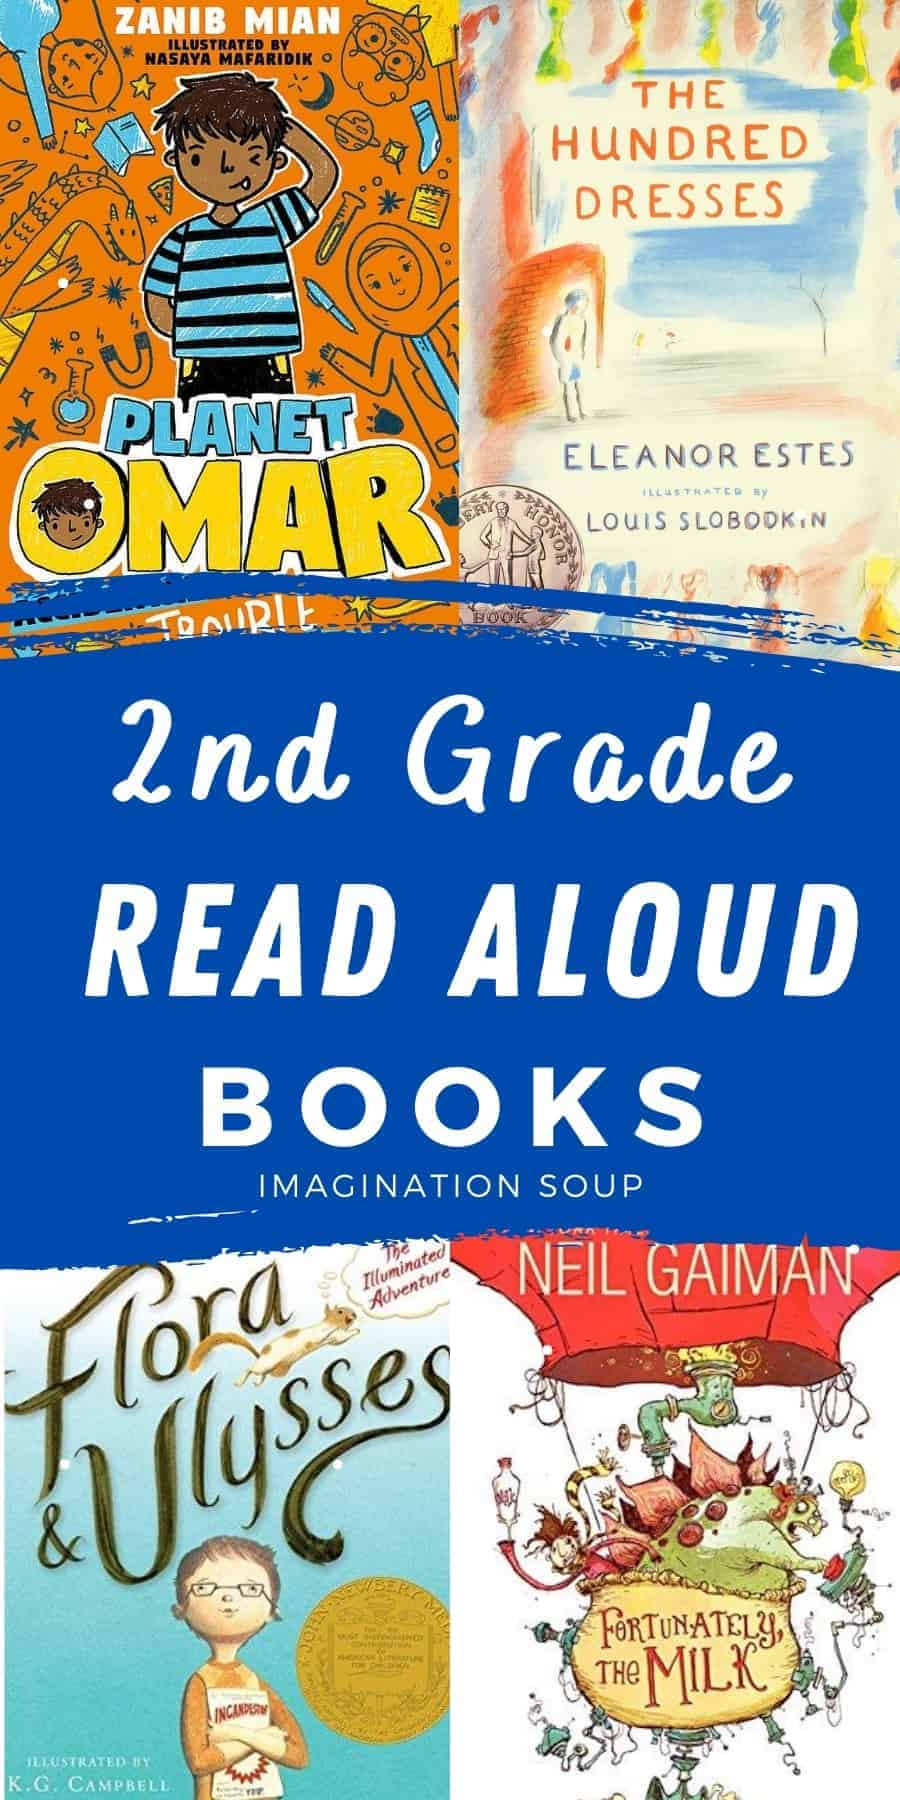 2nd grade read aloud books